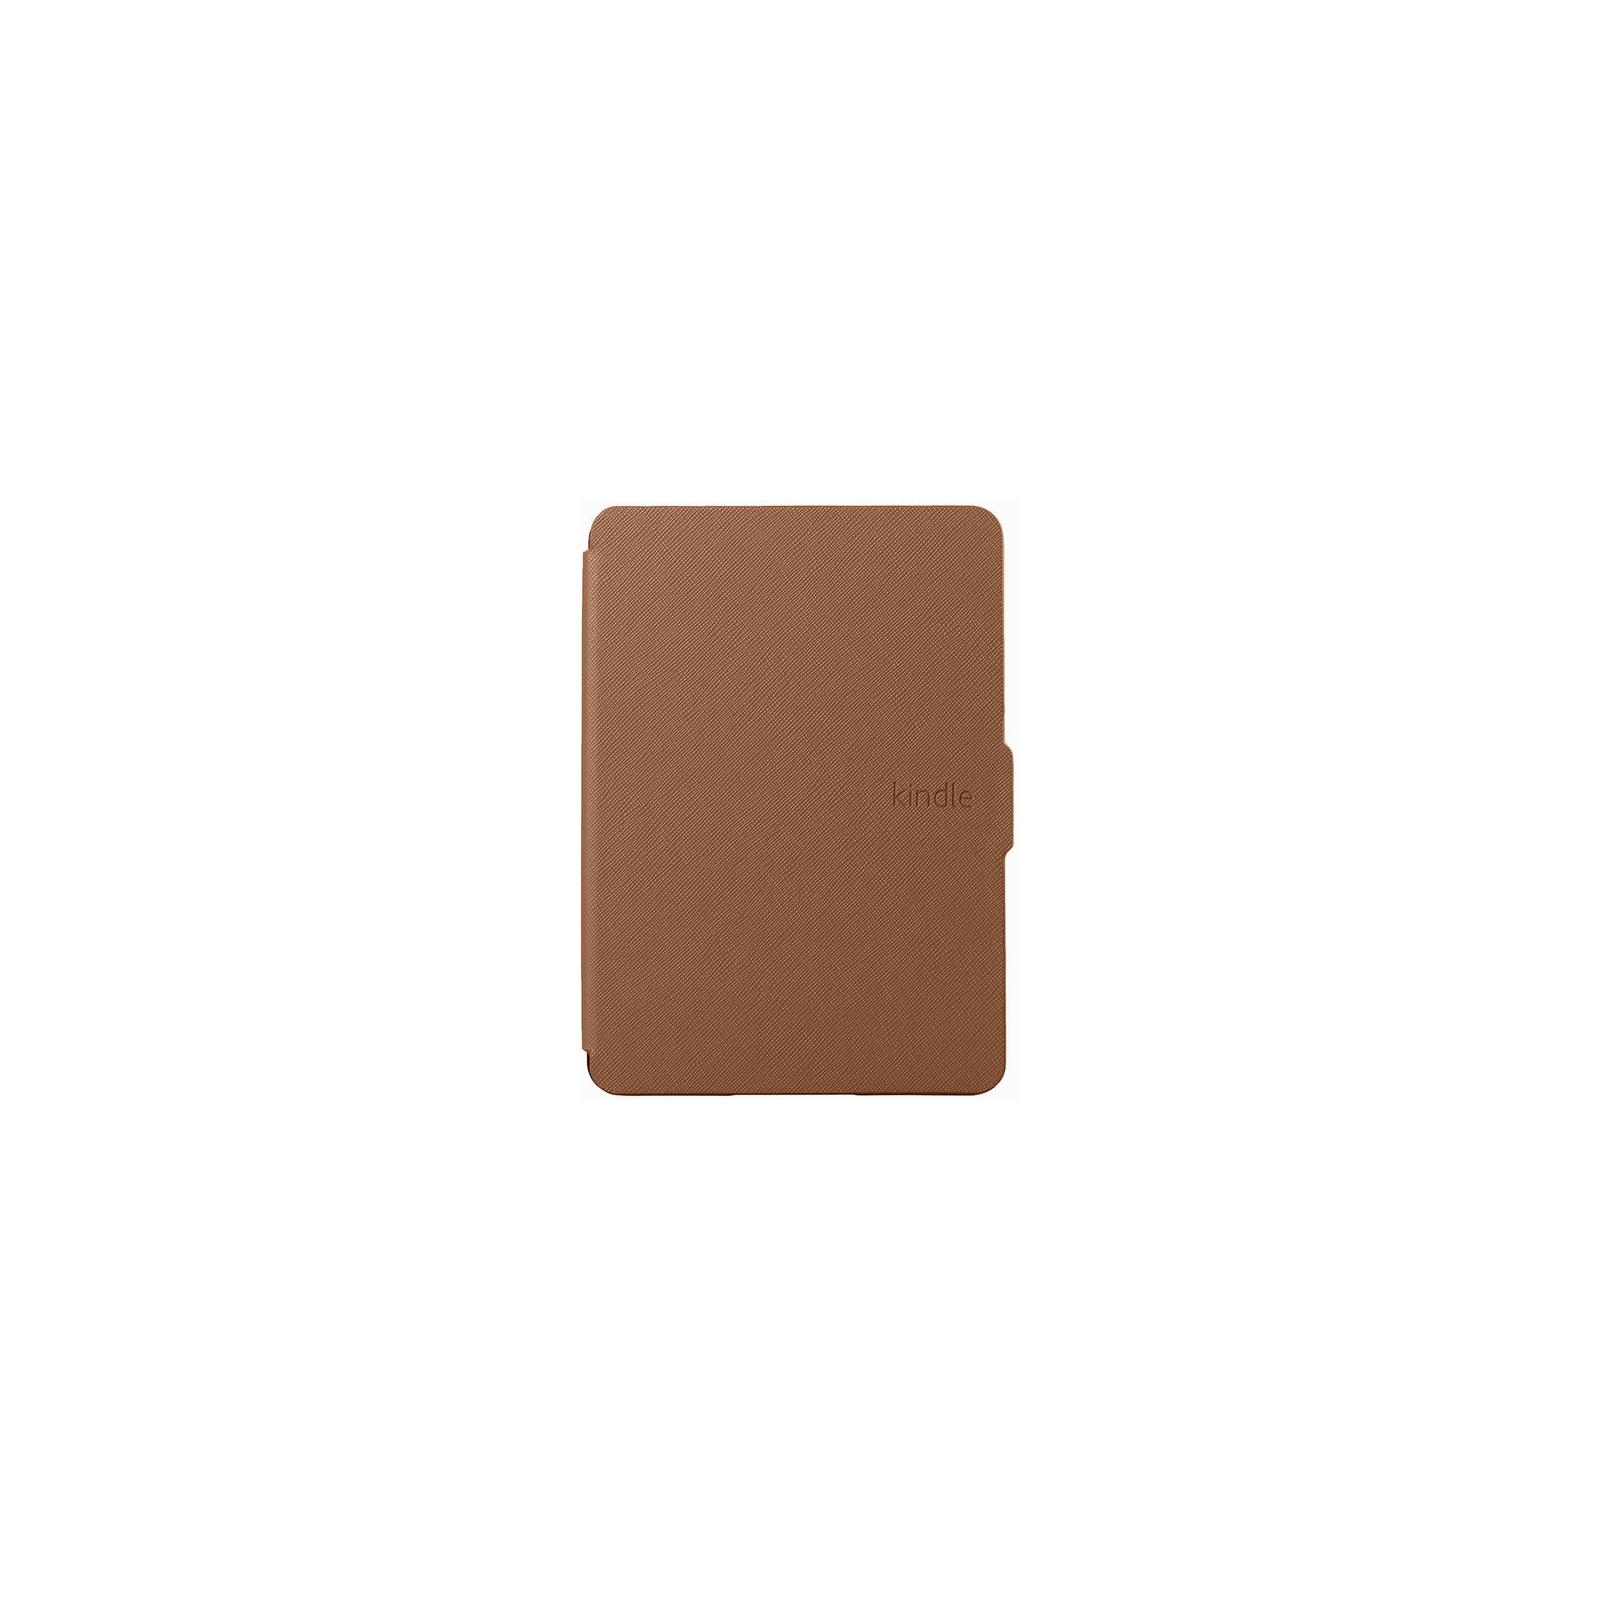 Чехол для электронной книги AirOn для Amazon Kindle 6 brown (4822356754494)